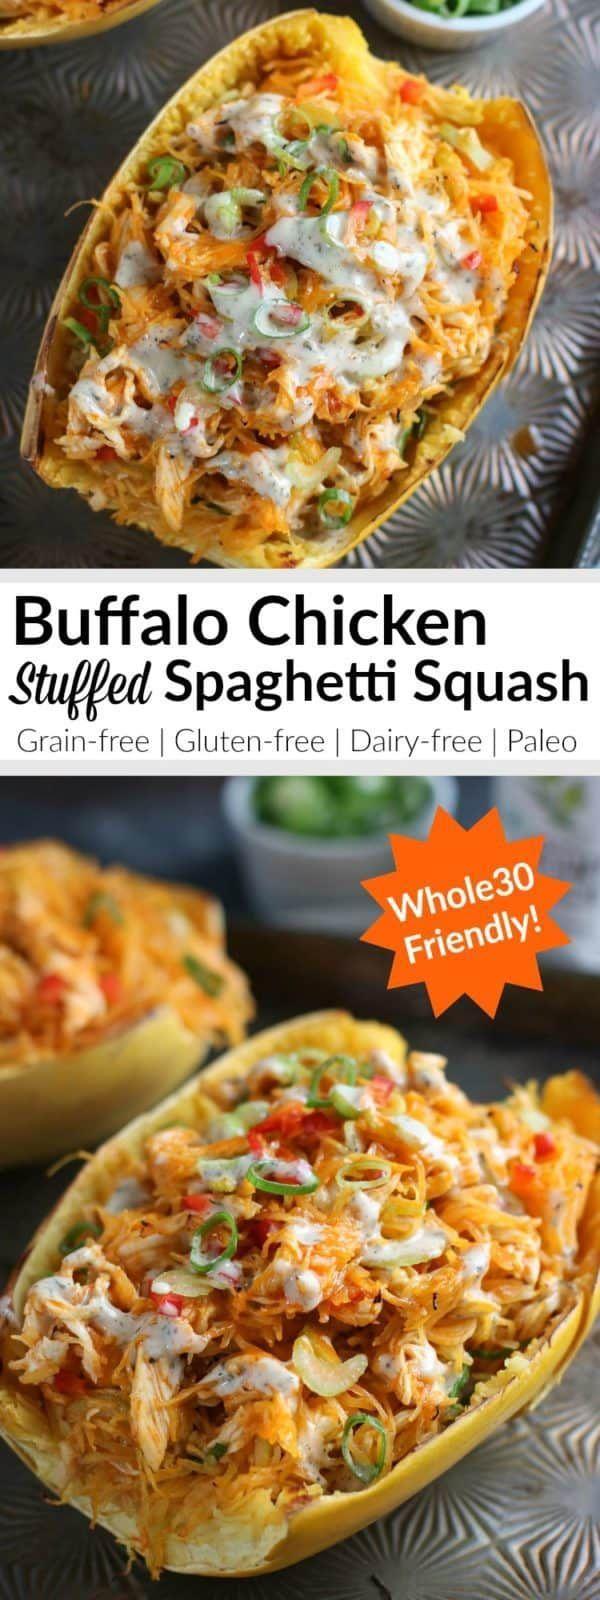 Buffalo Chicken Stuffed Spaghetti Squash   – Easy Dinners